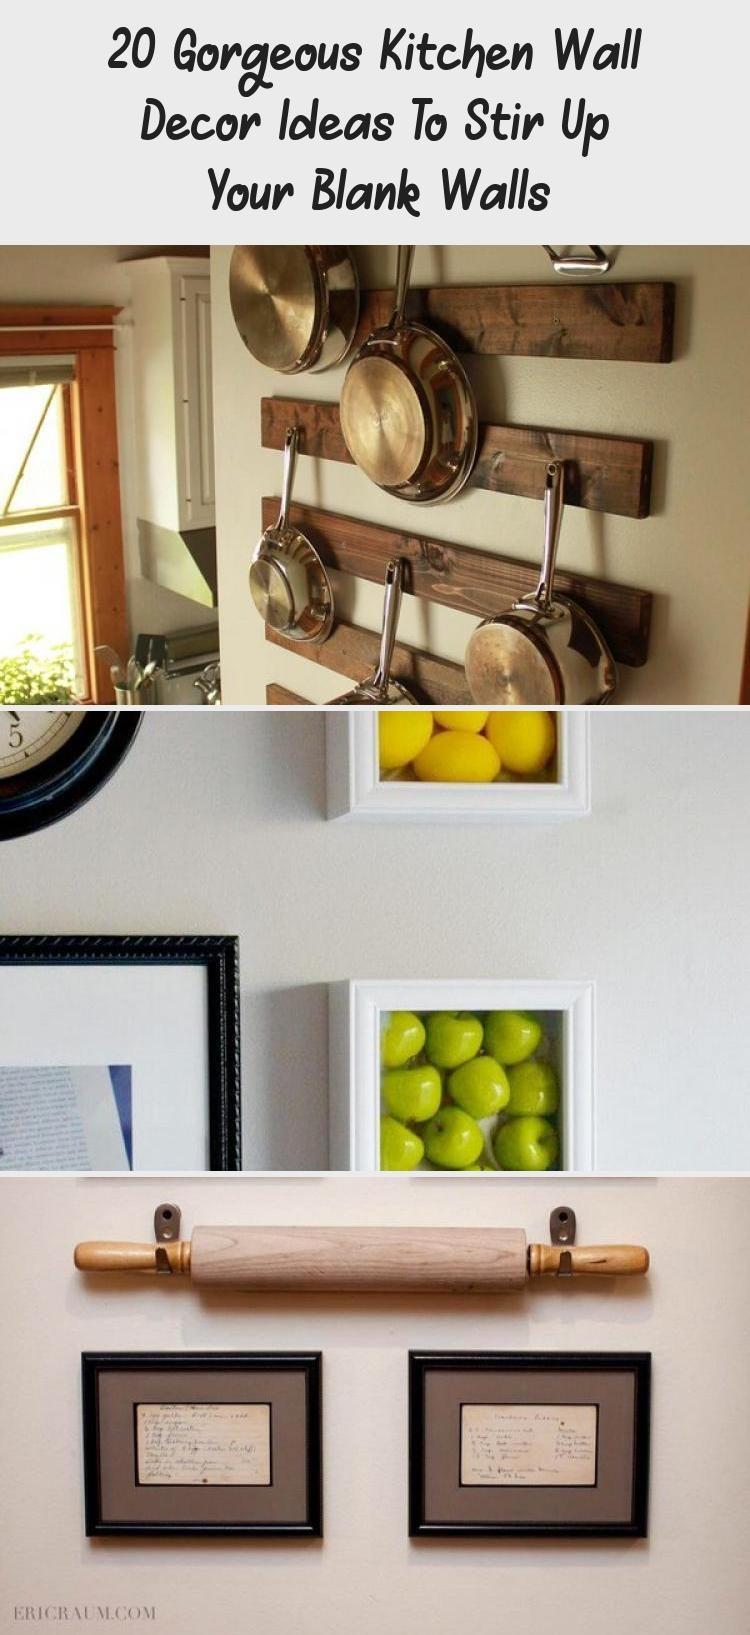 20 Gorgeous Kitchen Wall Decor Ideas To Stir Up Your Blank Walls Decoration Kitchens